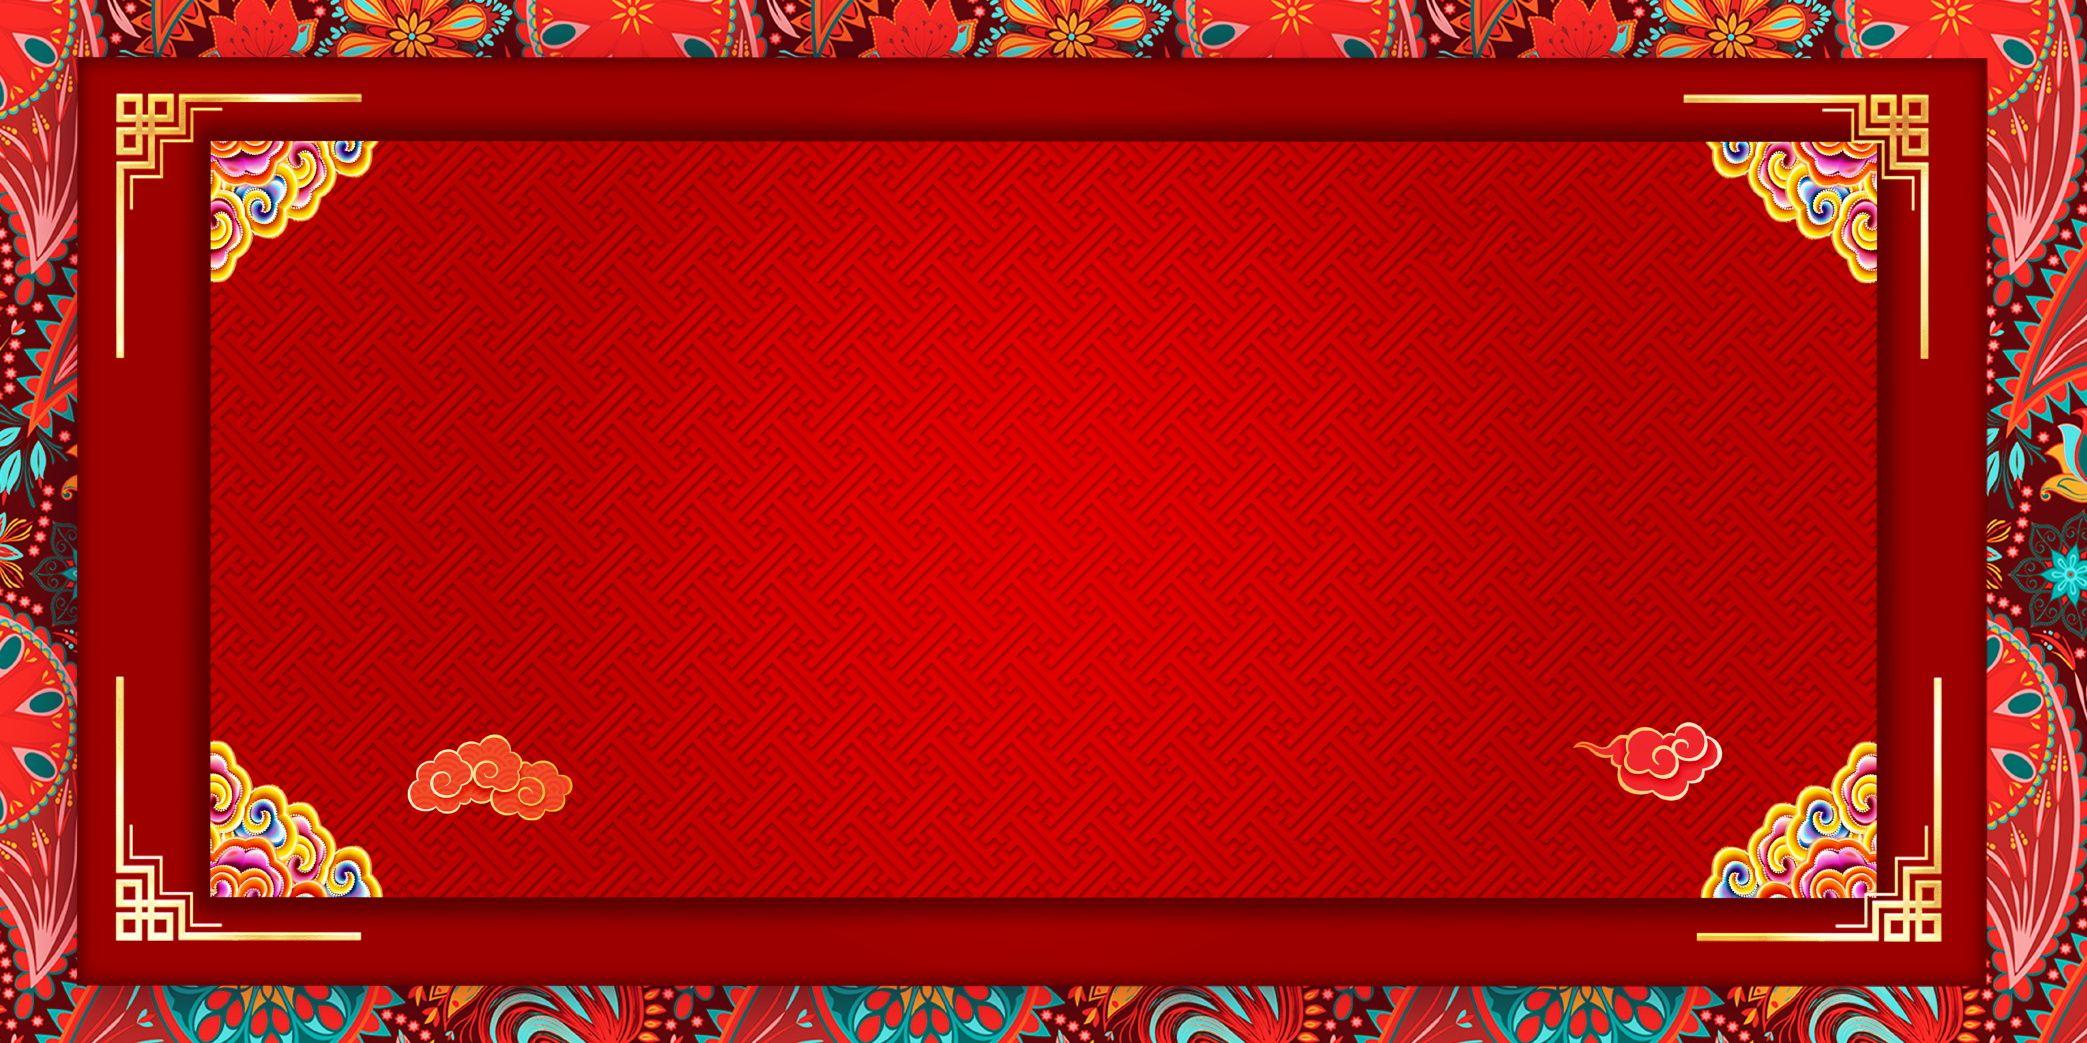 Chinese Style Red New Year Background Design วอลเปเปอร์